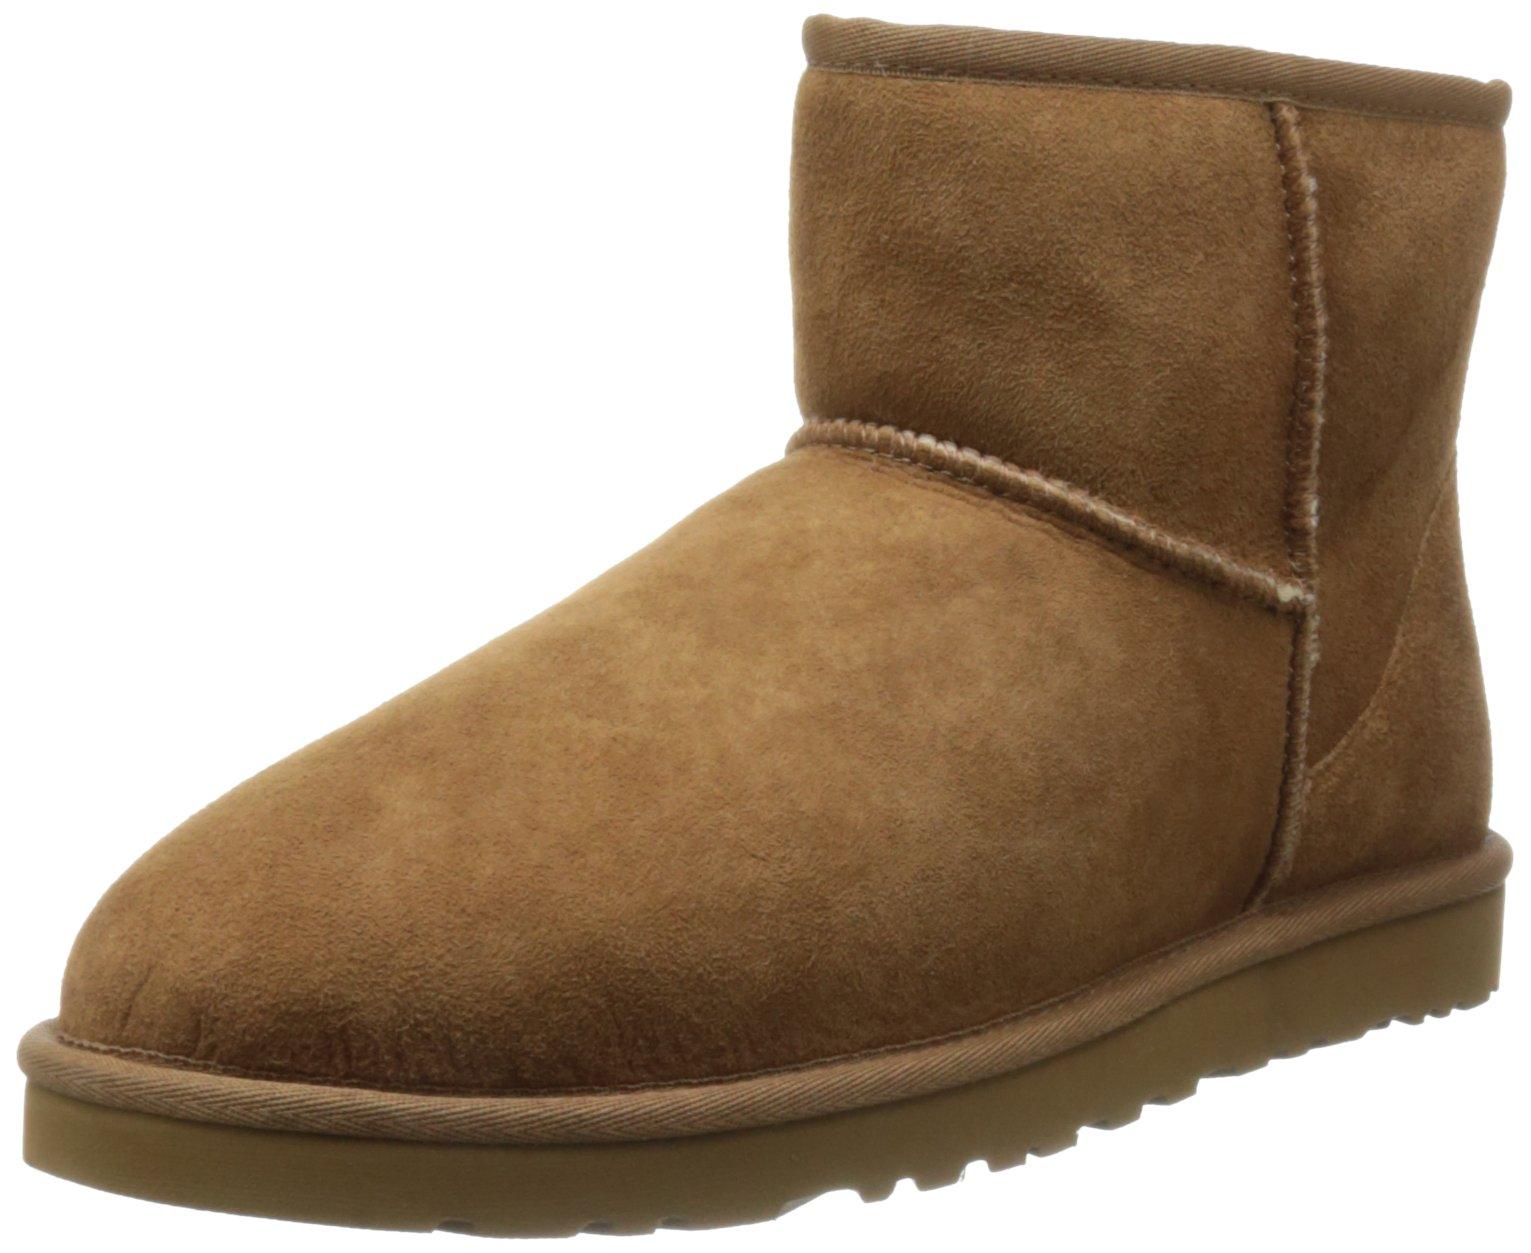 Ugg Men's Classic Mini Winter Boot, Chestnut, 10 US/10 M US